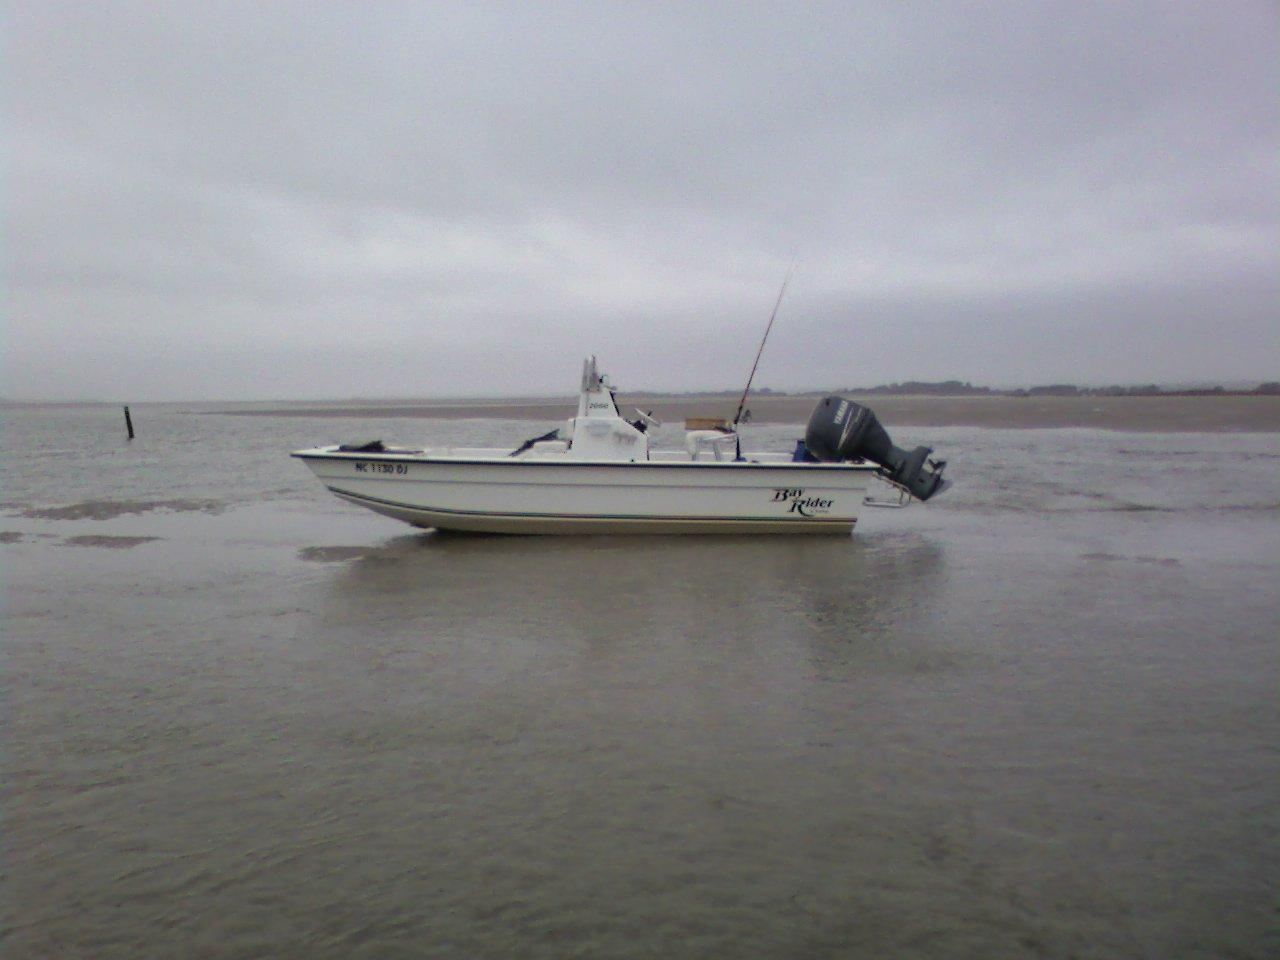 Us coast guard auxiliary flotilla 20 10 swansboro nc 5th cg local marine information nvjuhfo Gallery